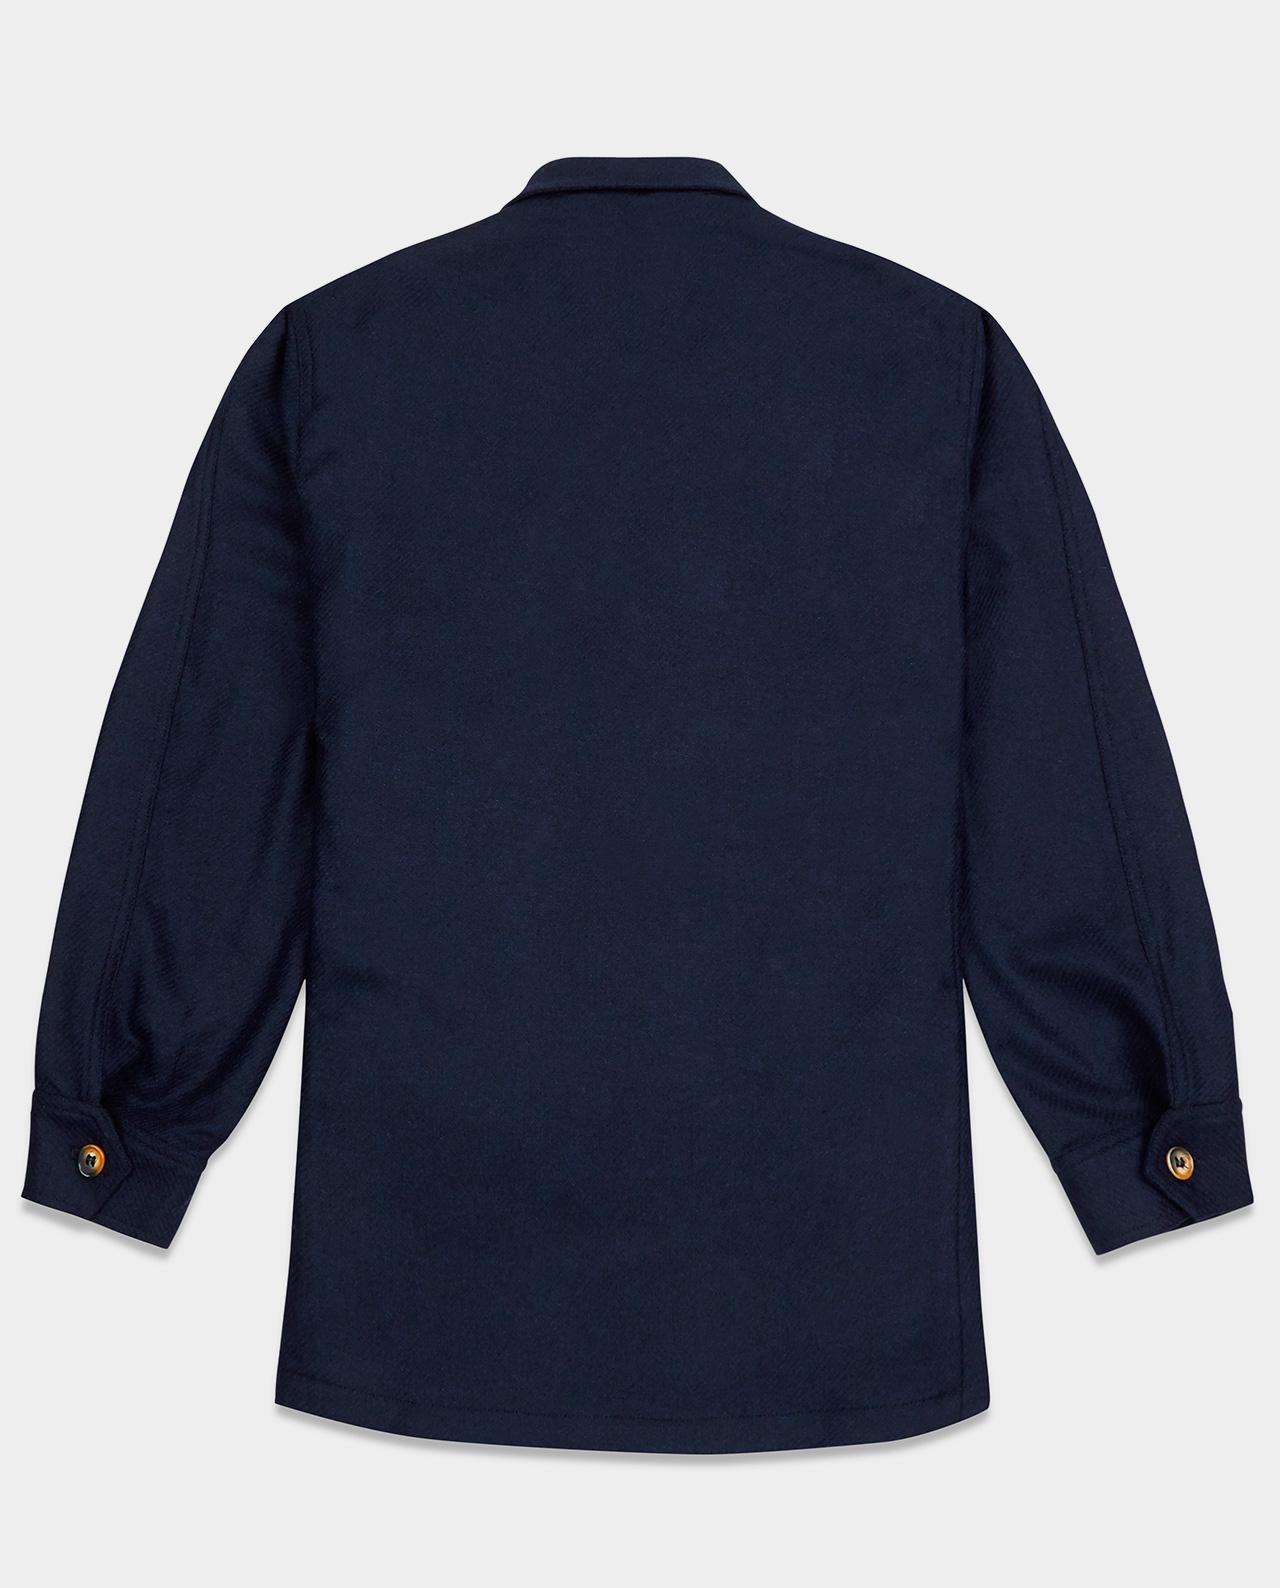 Last of England Teba Jacket Herringbone Navy